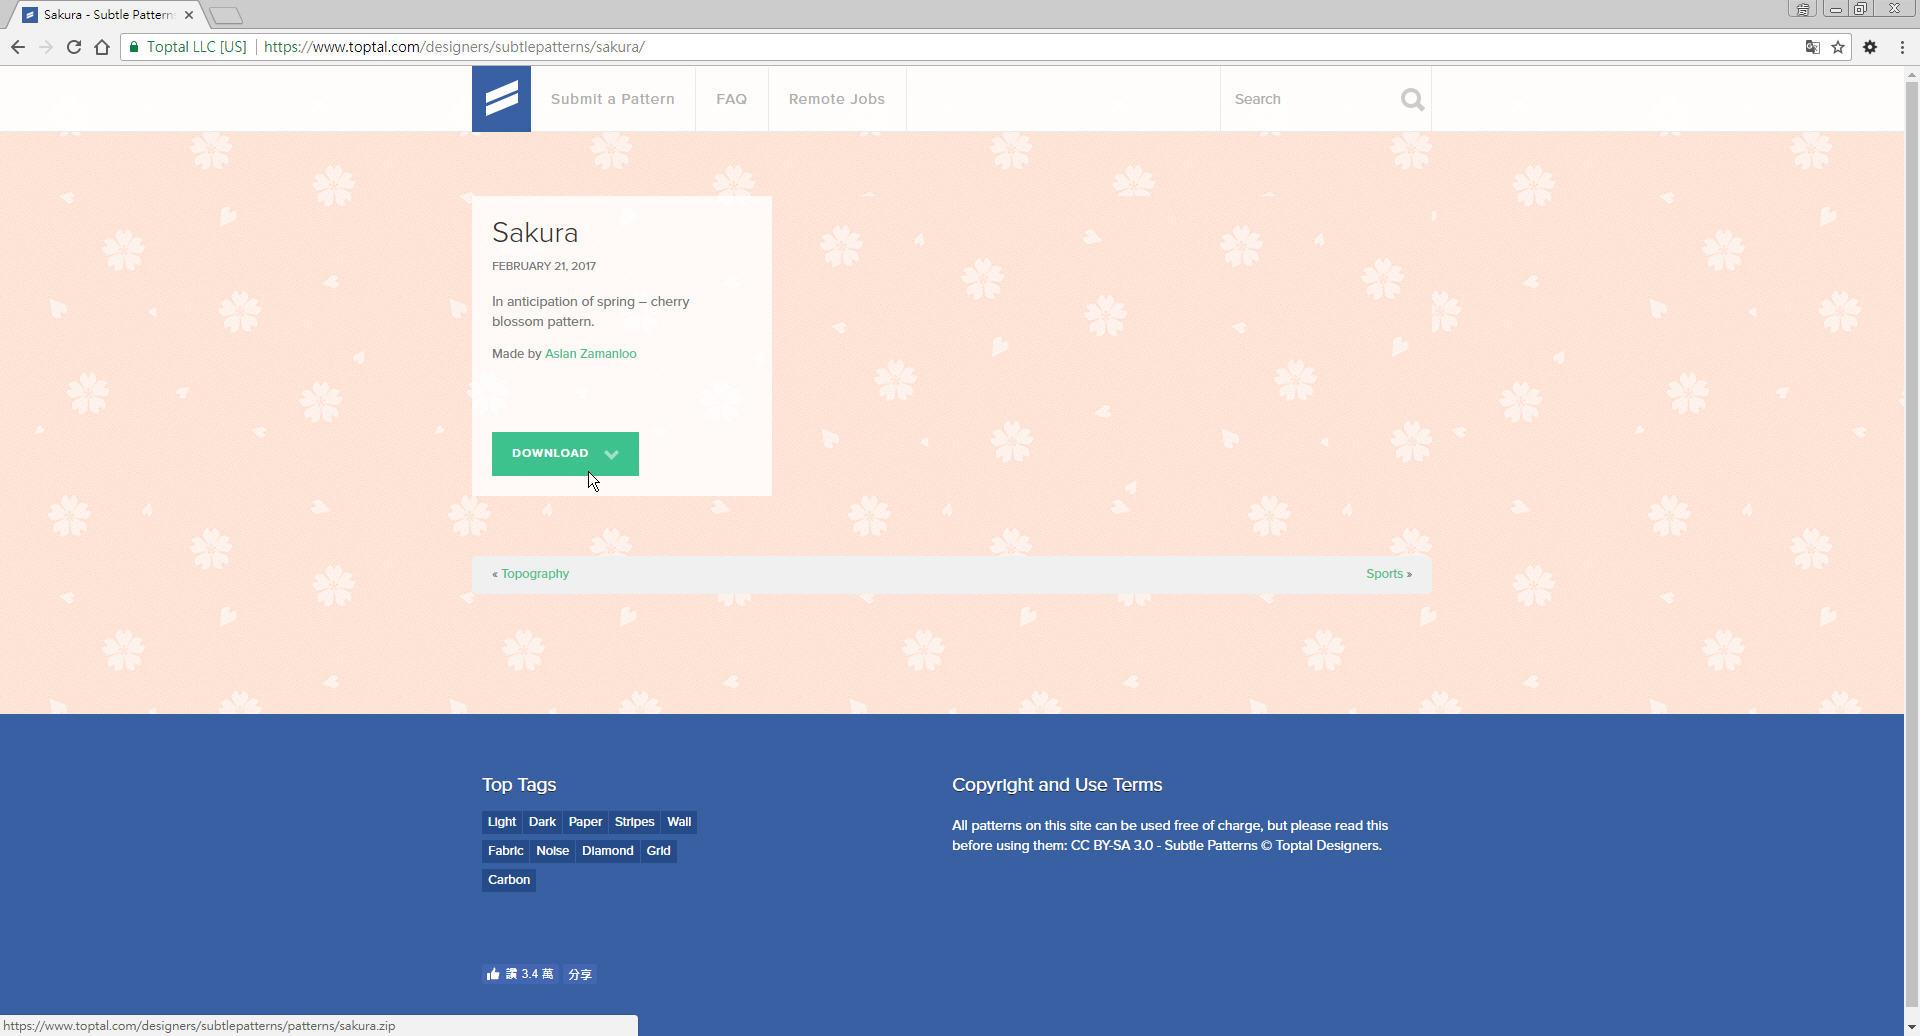 Free Resource 好康報報 Good Design 好站報報  - 【設計資源】Subtle Patterns - 免費下載之 pattern 素材網站 - p-8